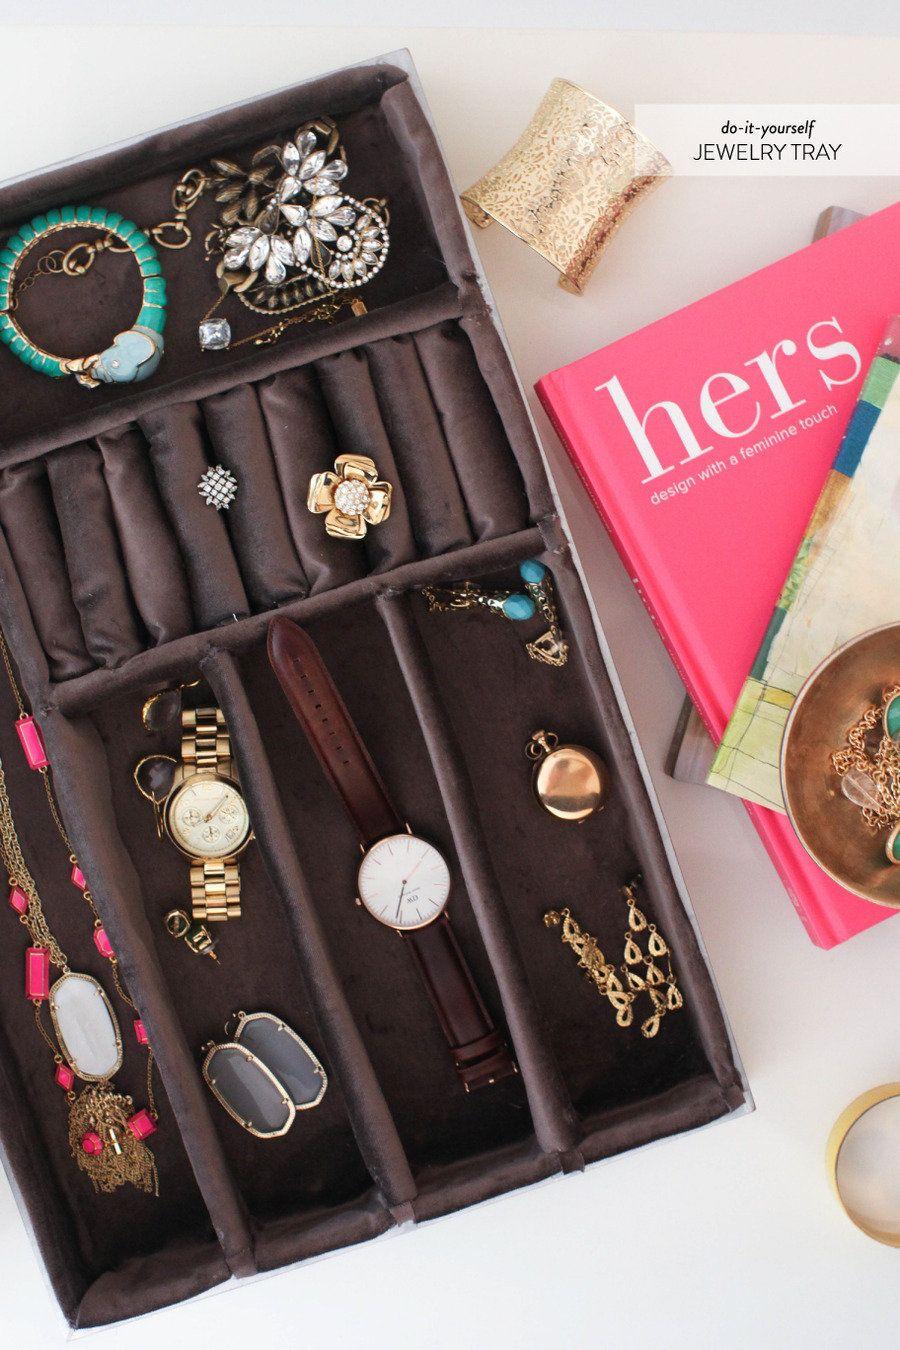 Diy velvet jewelry tray homemade jewelry and bijoux for Velvet jewelry organizer trays